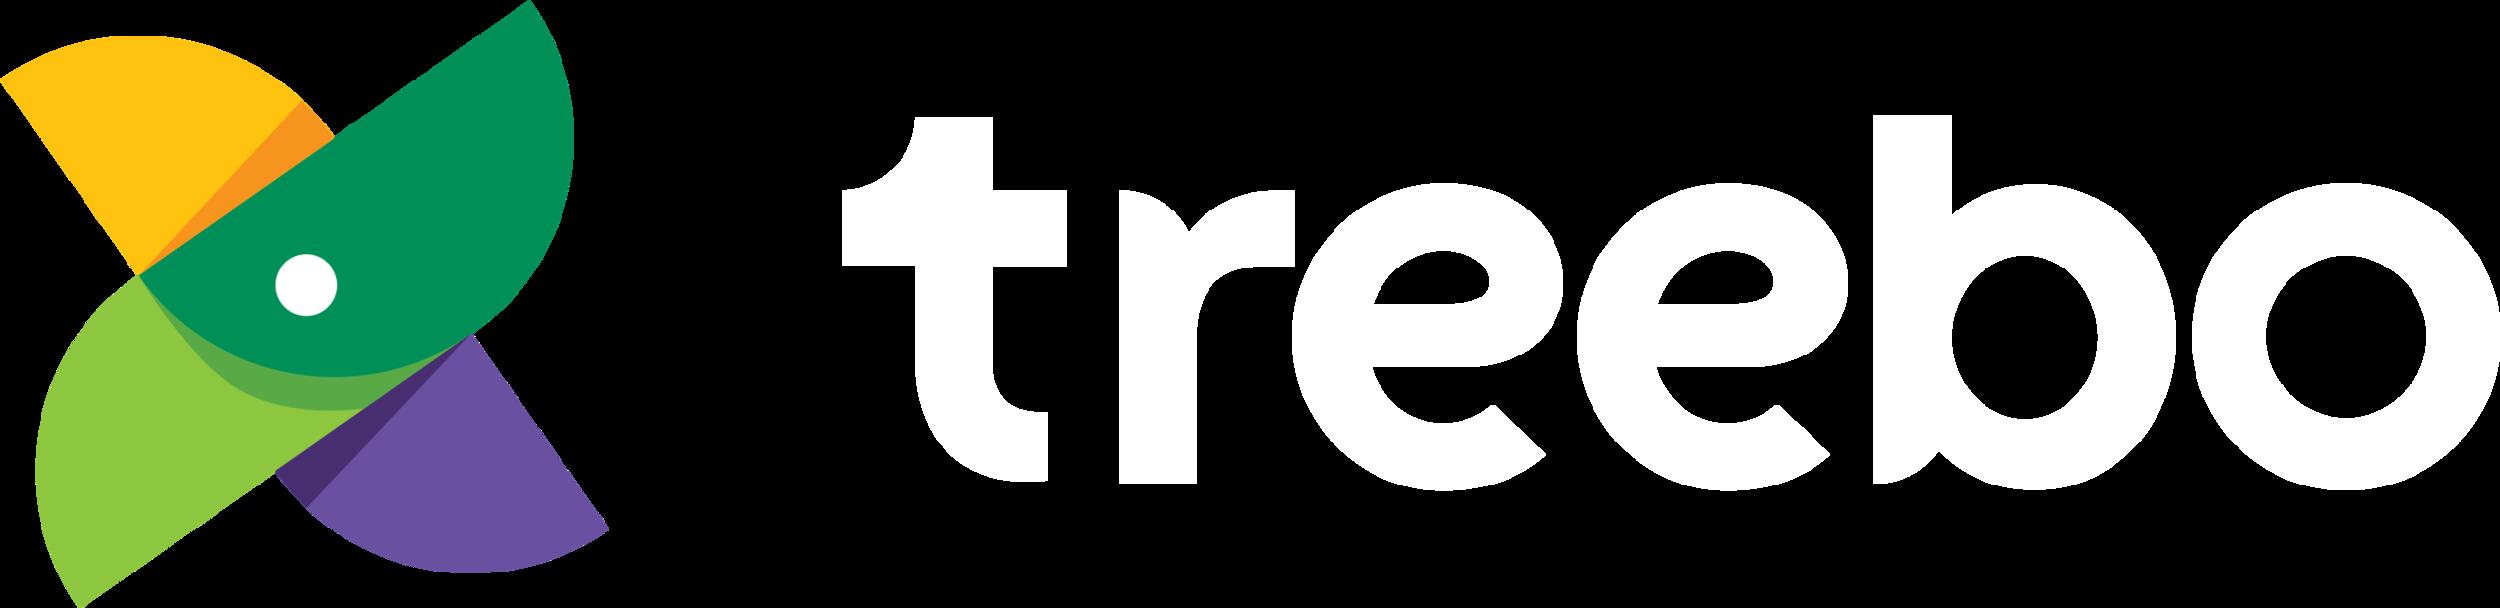 treebo-depth-blackbg-horizontal.png